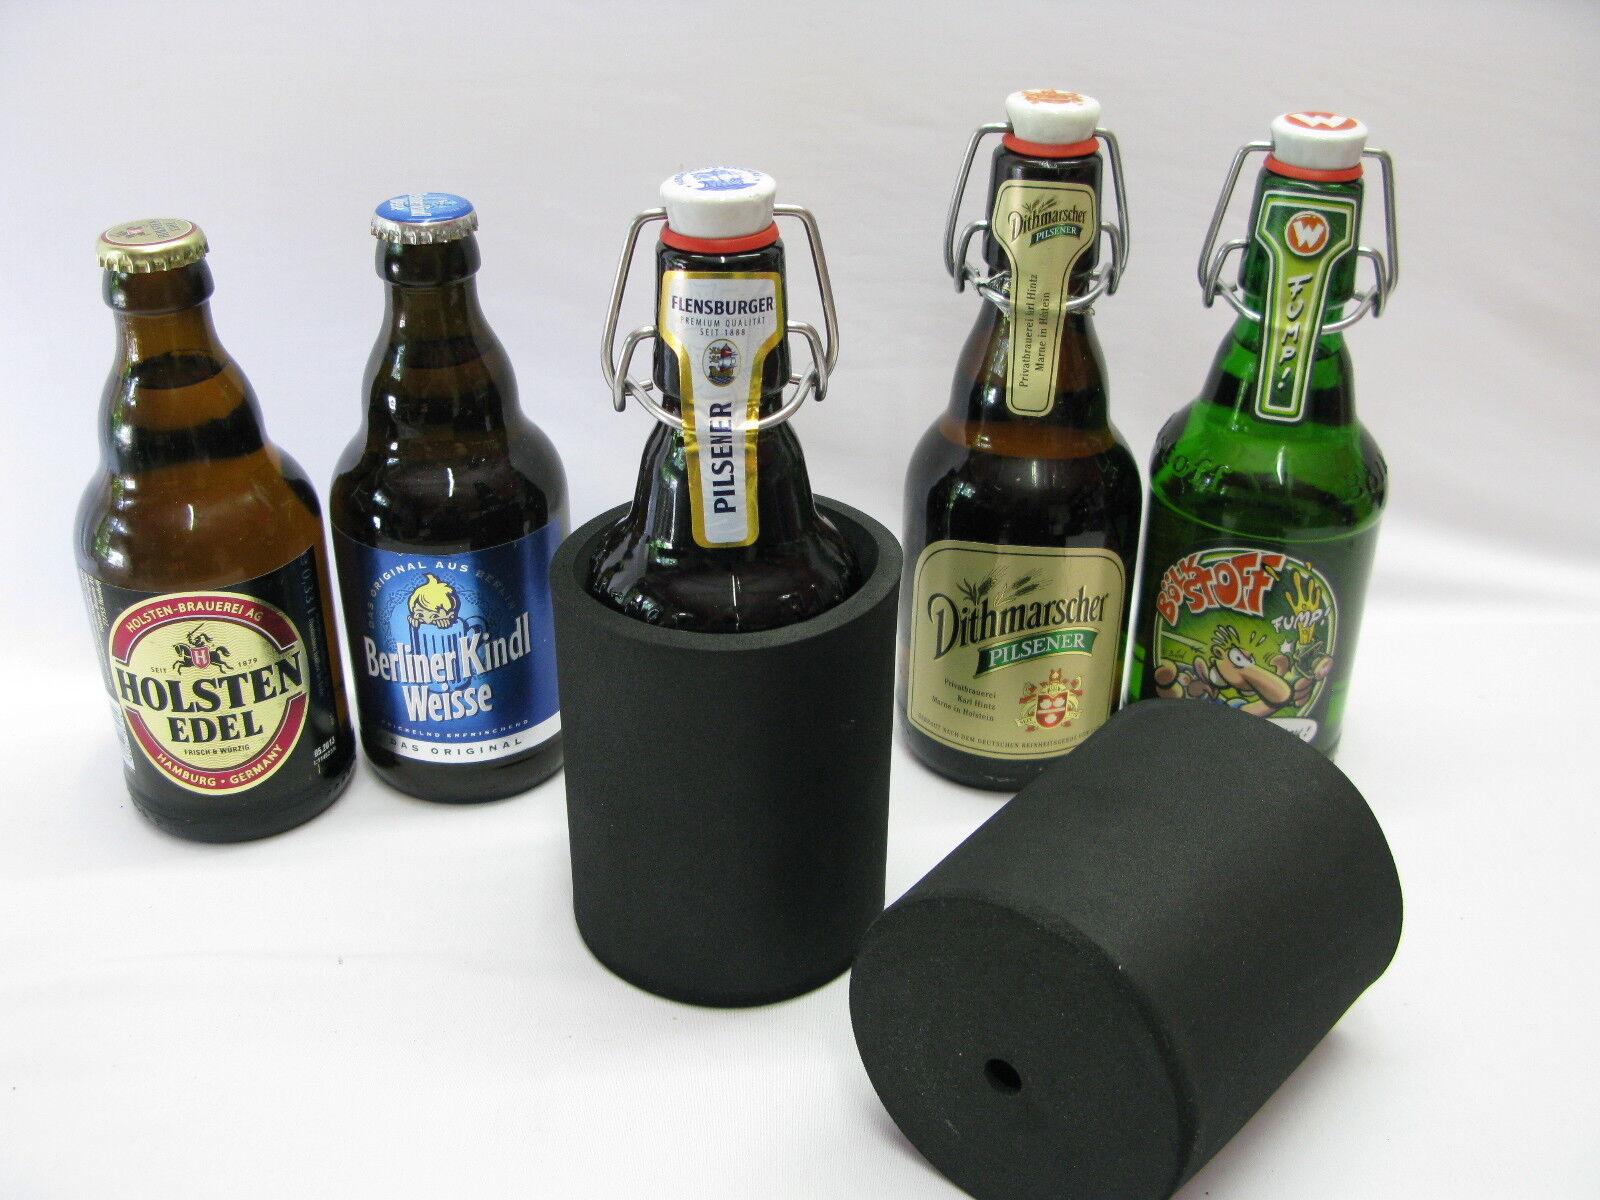 6er Set Getränkekühler 0,33l Flasche - Bierkühler - Neoprenkühler  Stubby Cooler